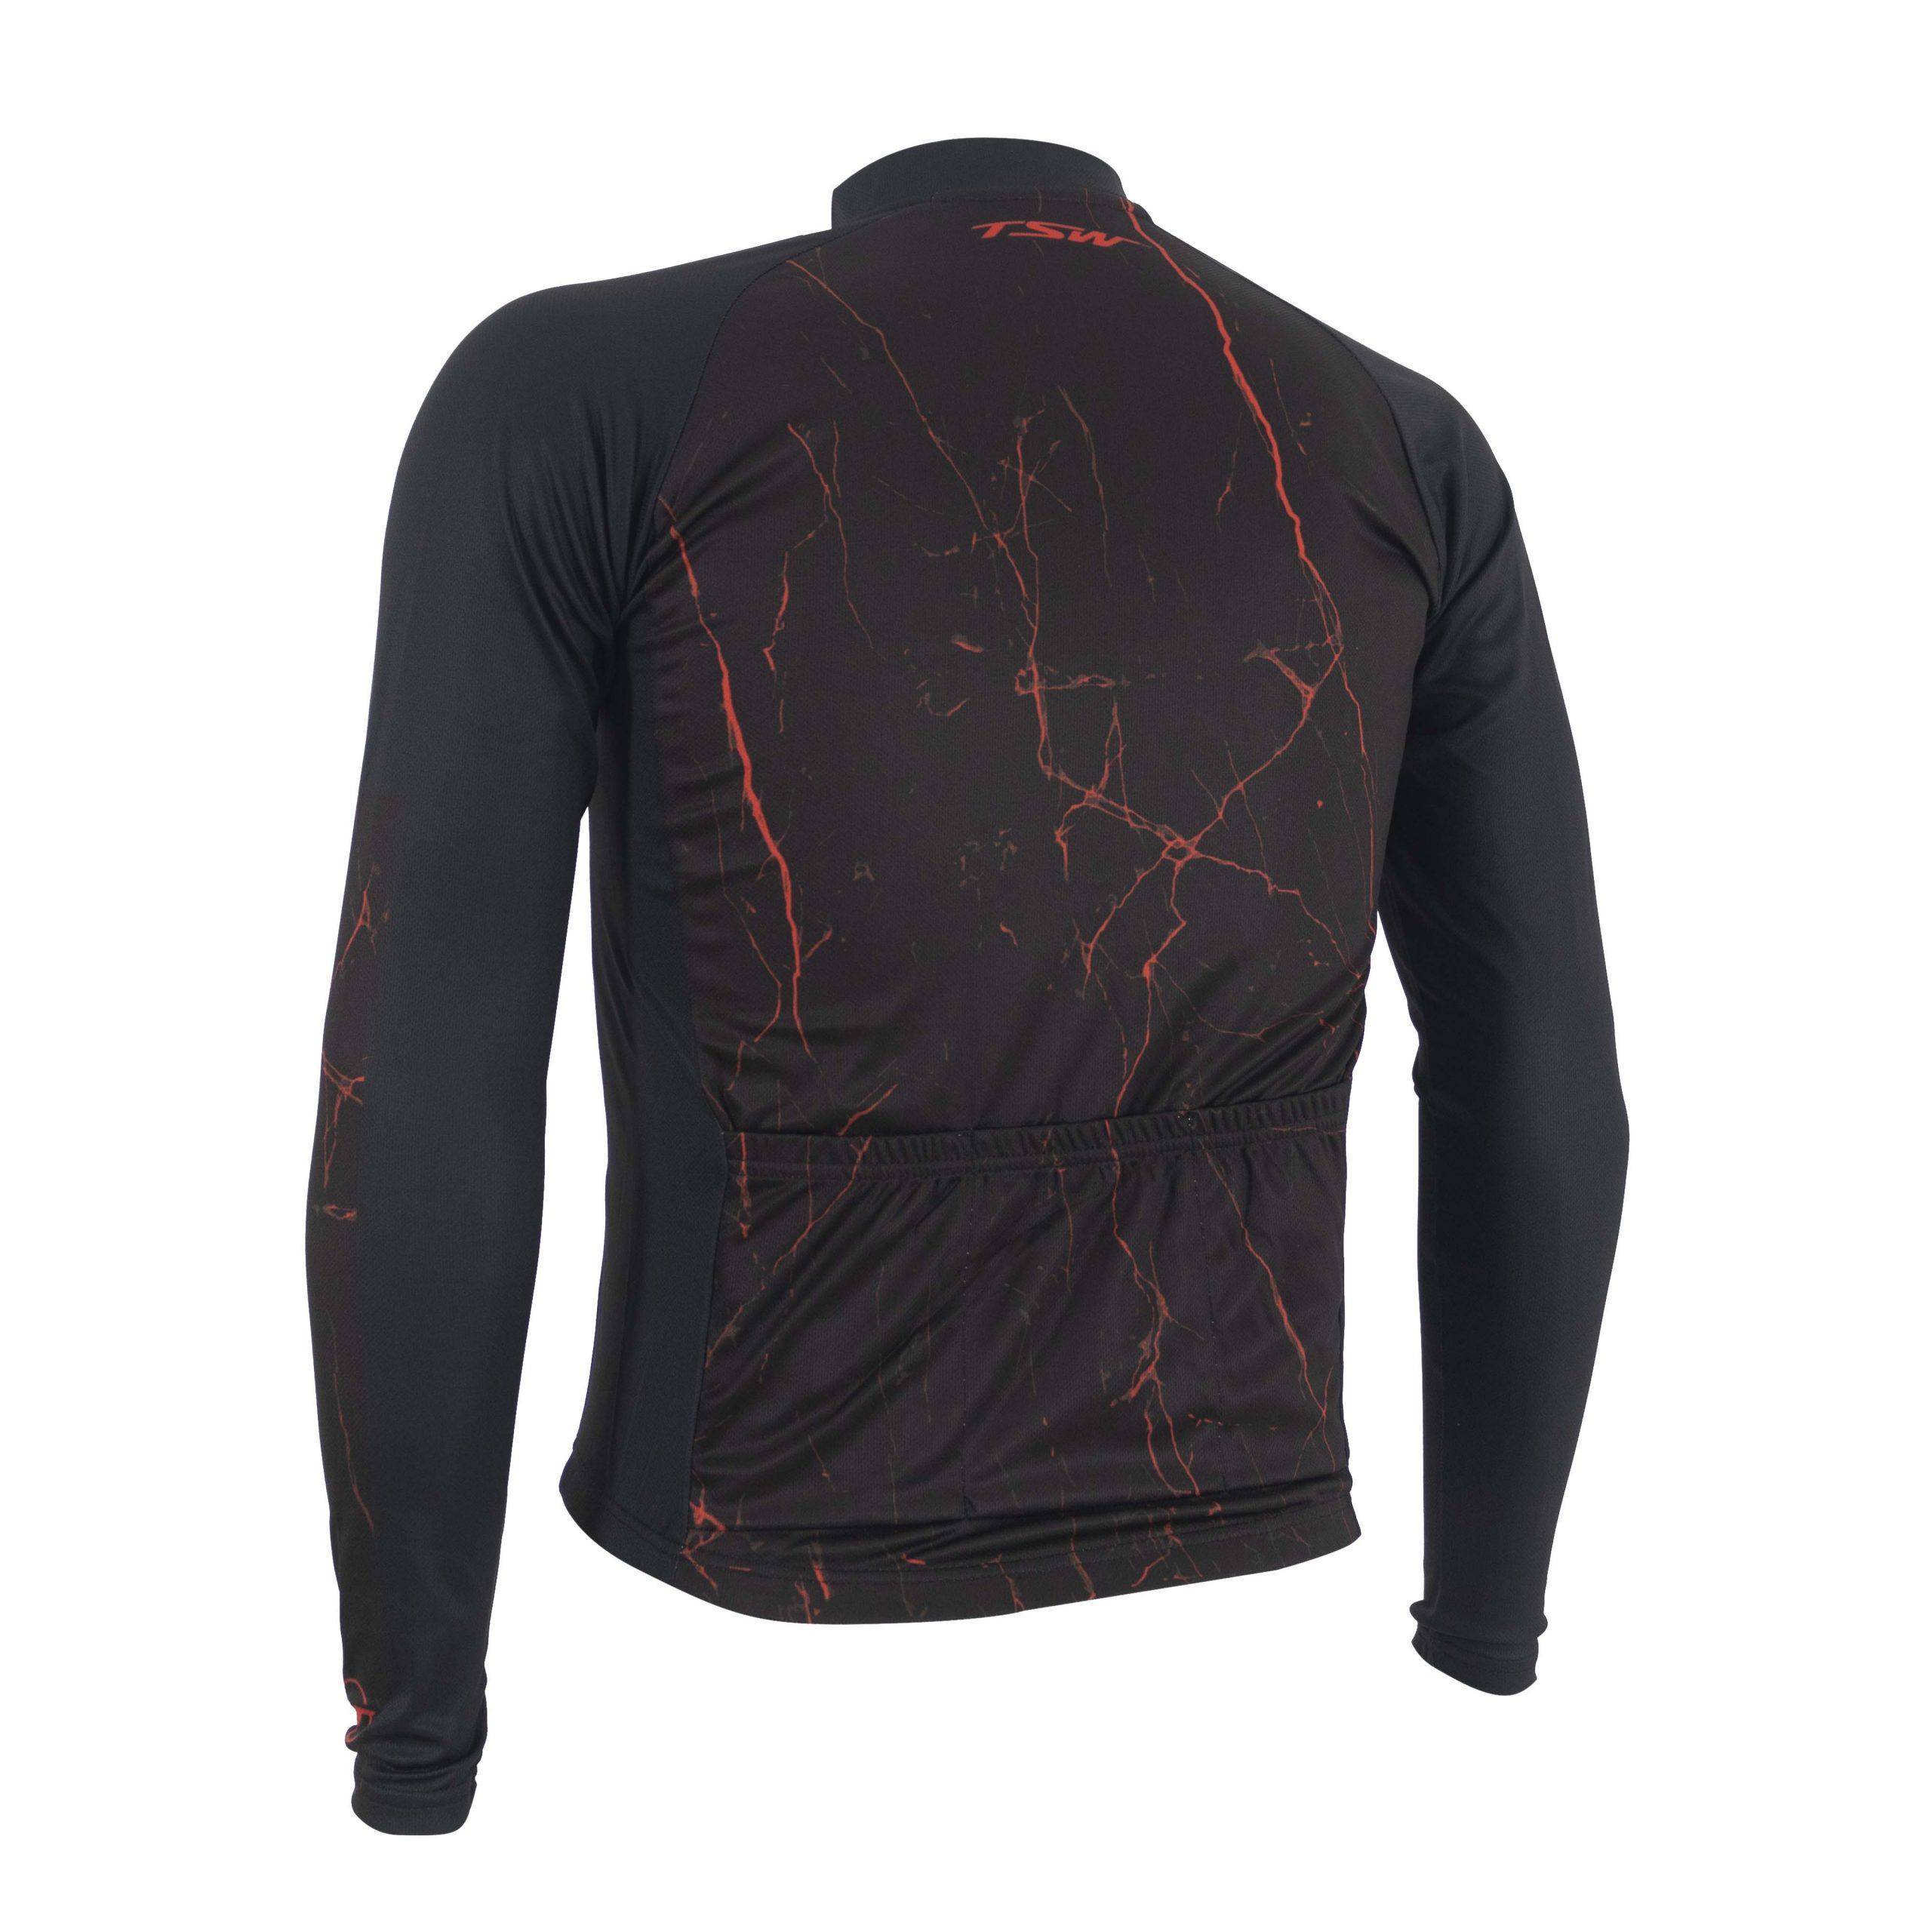 Camisa manga longa para ciclismo STORM | PRO LINE 4